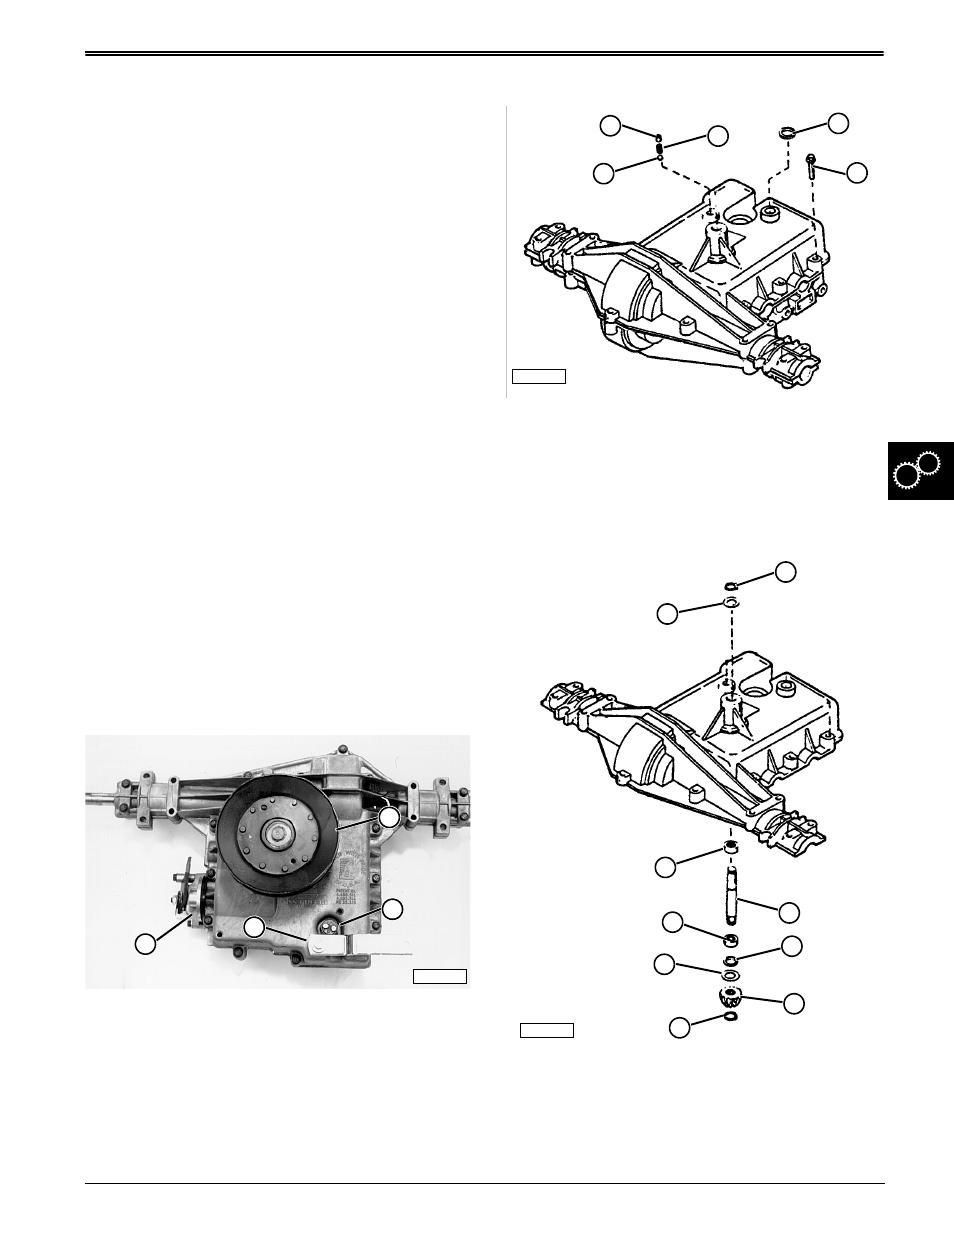 John Deere Stx38 Repair Manual Best Deer Photos Alternator Wiring Diagram Manuals Omview User Page 207 314 Original Mode